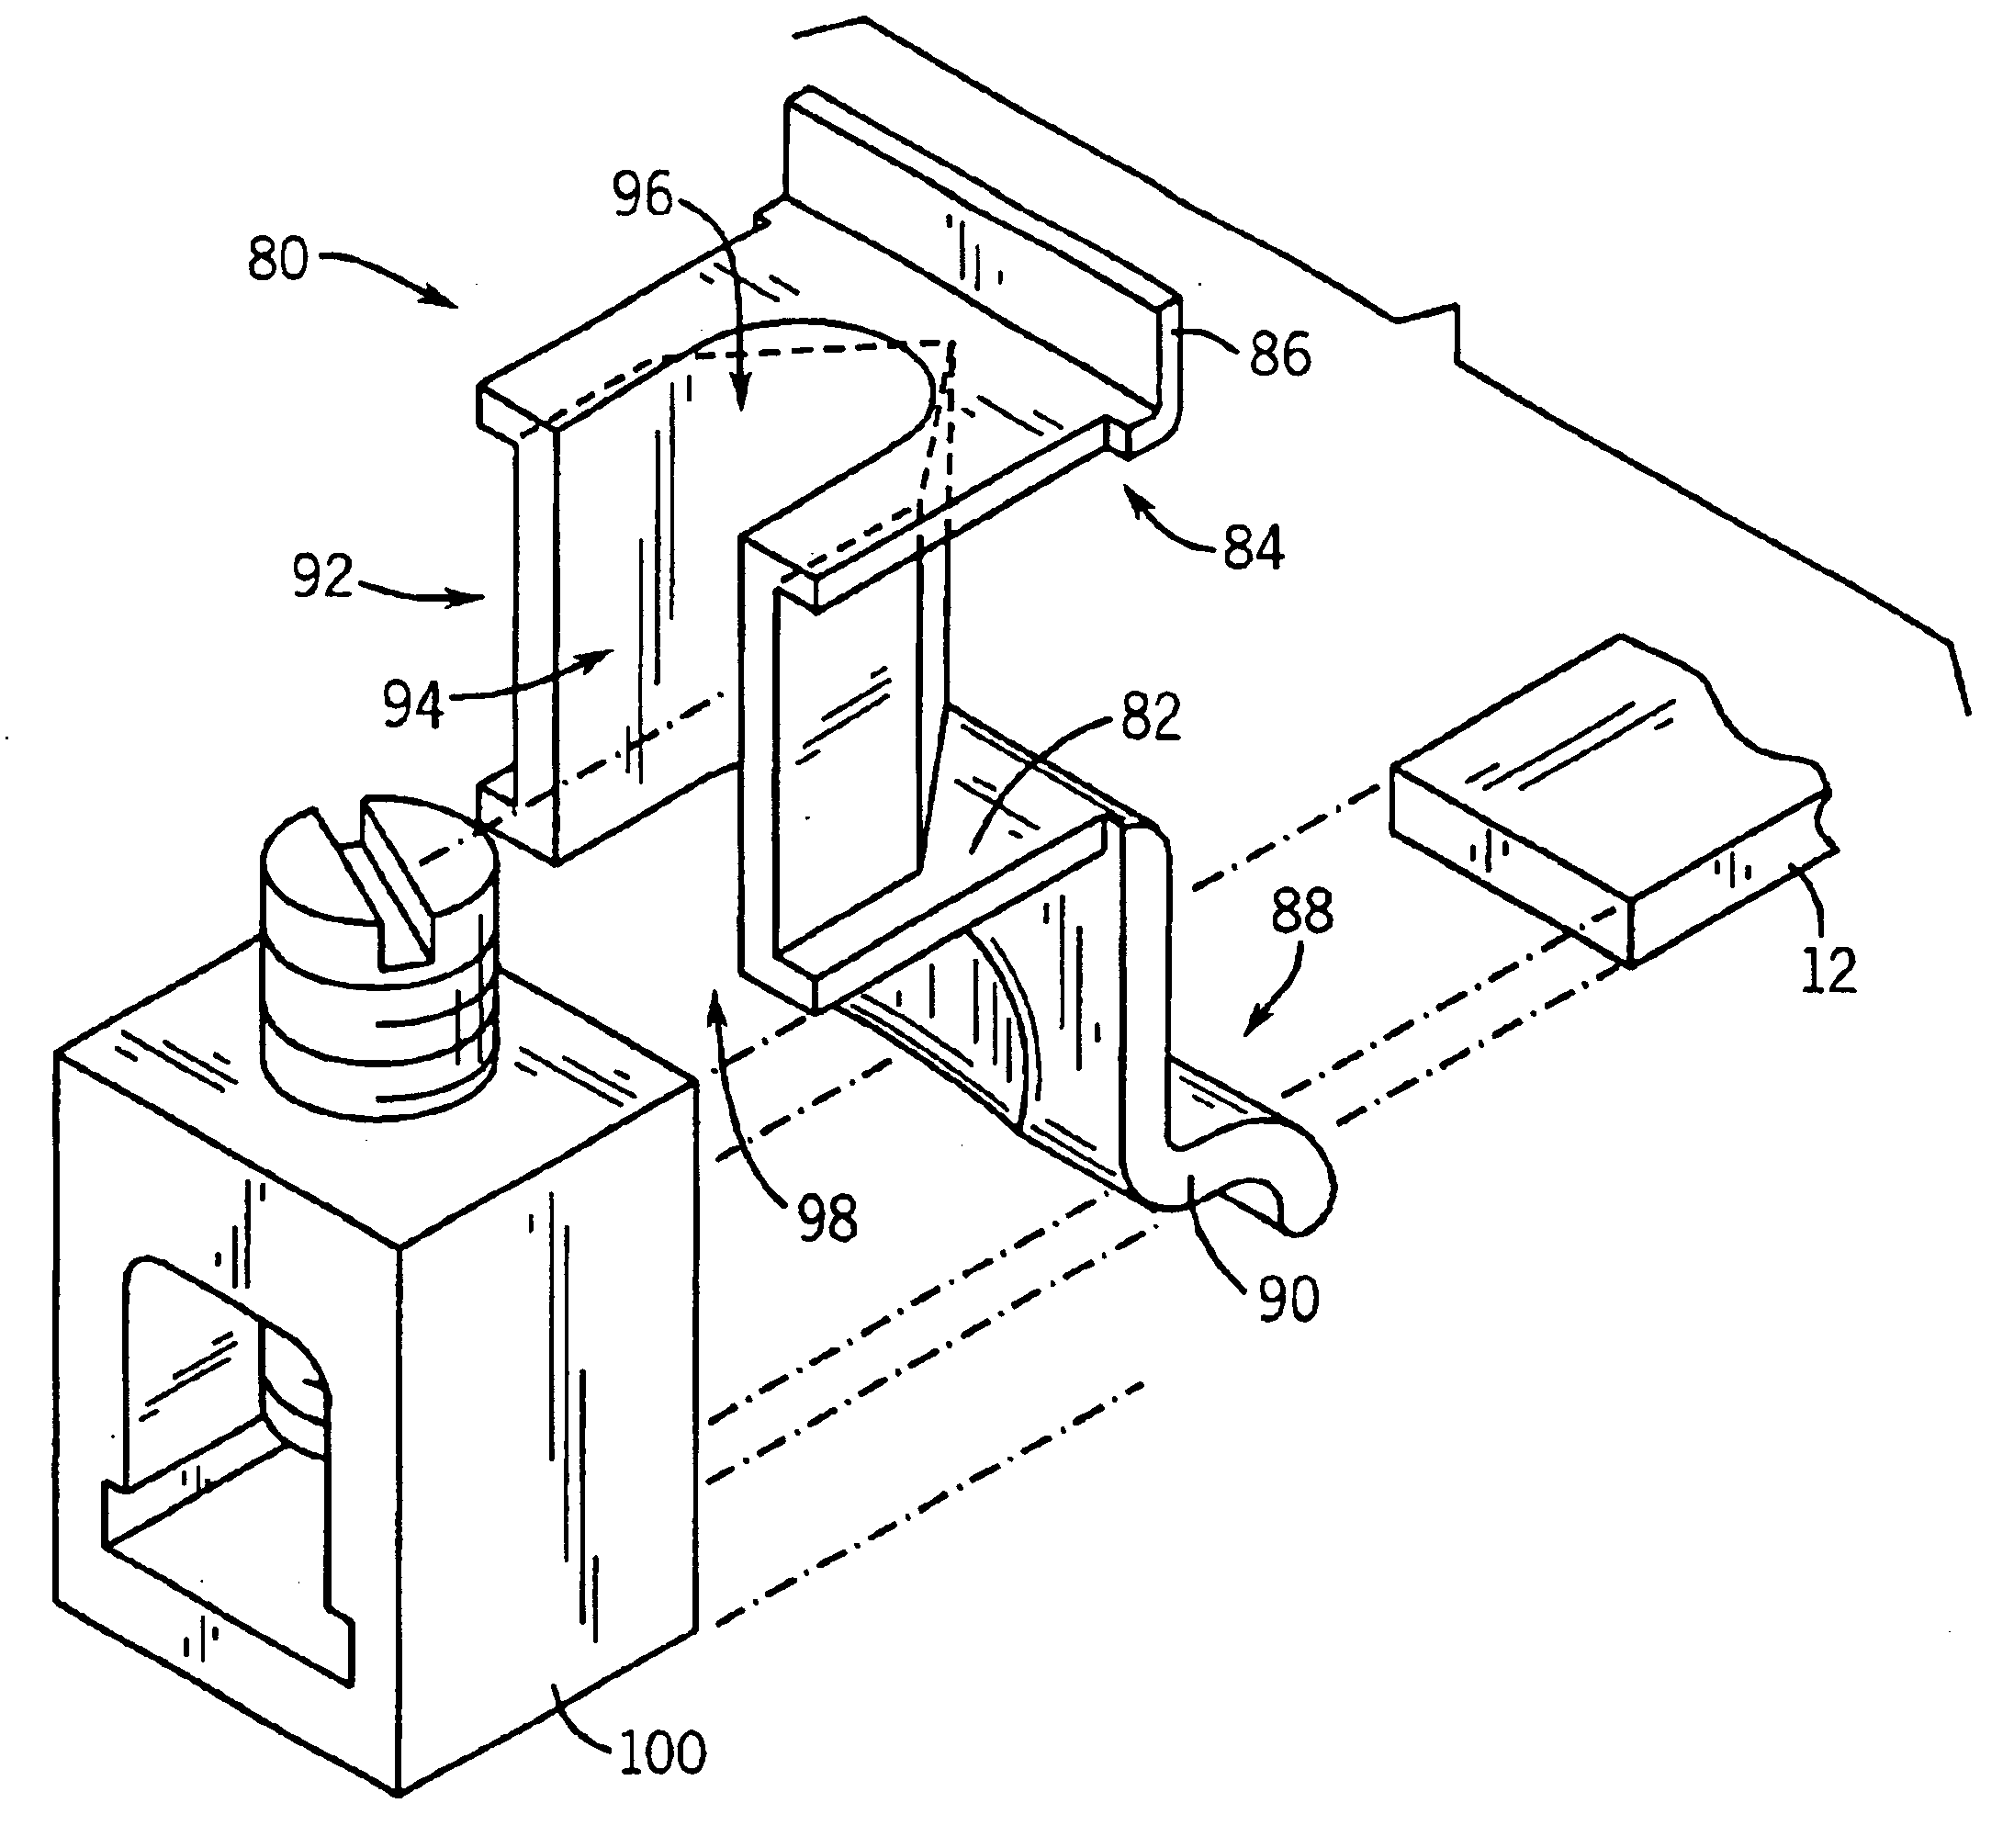 case 220 wiring diagram  case  get free image about wiring